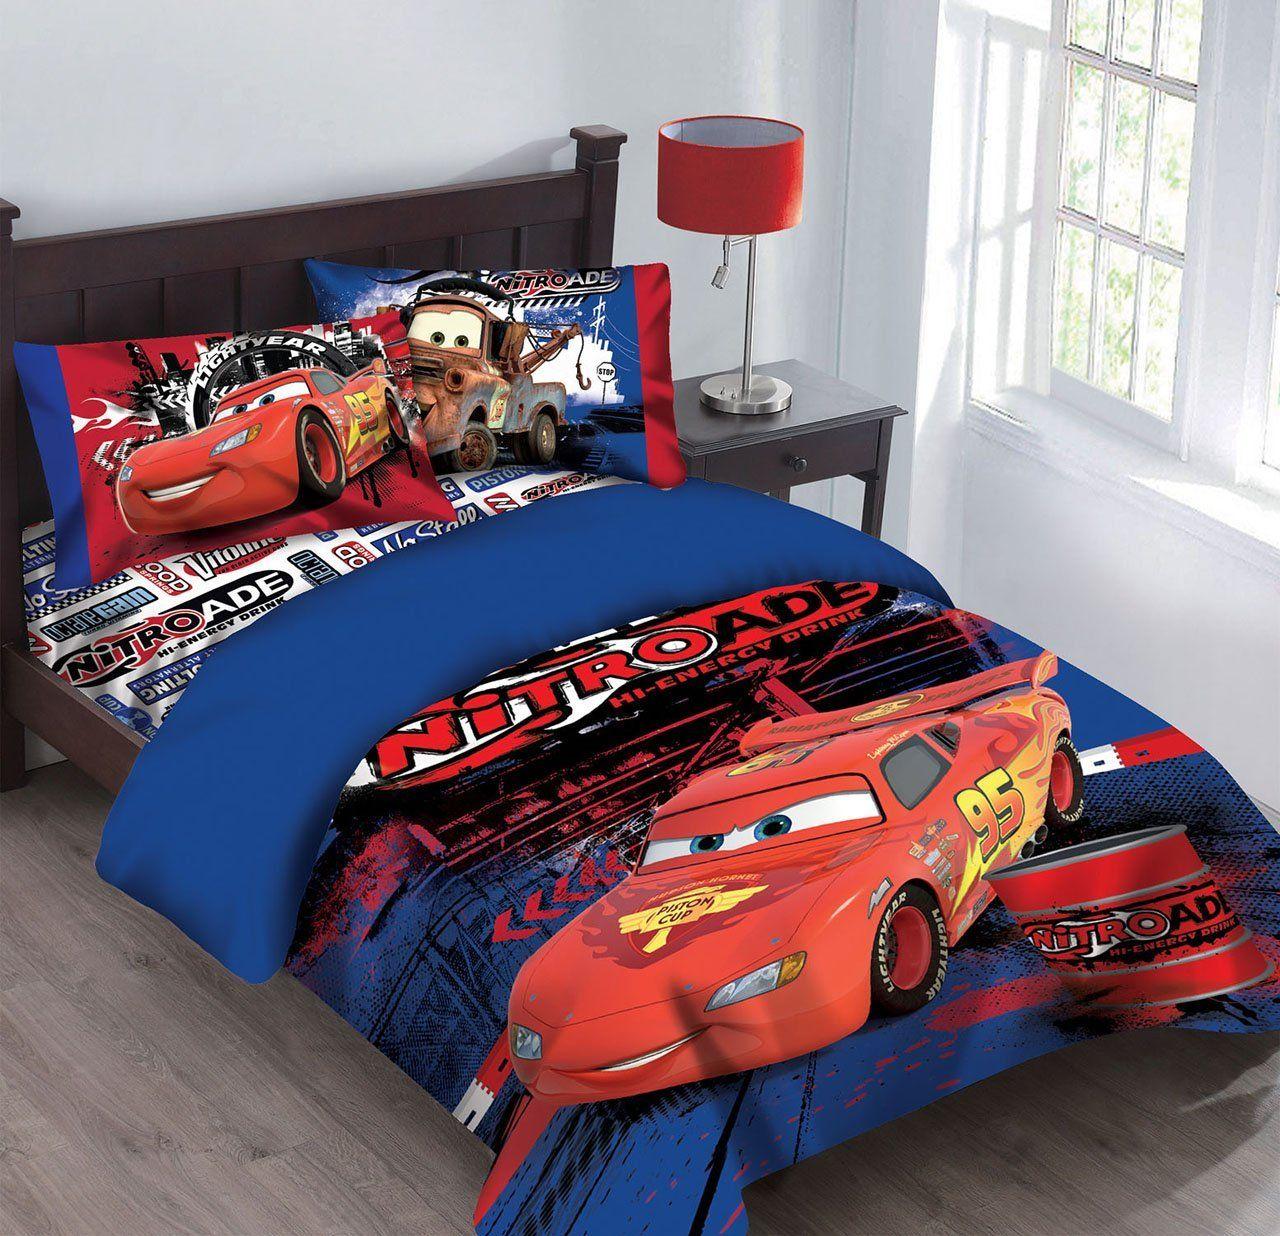 Disney Cars Nitroade Full Bedding Comforter